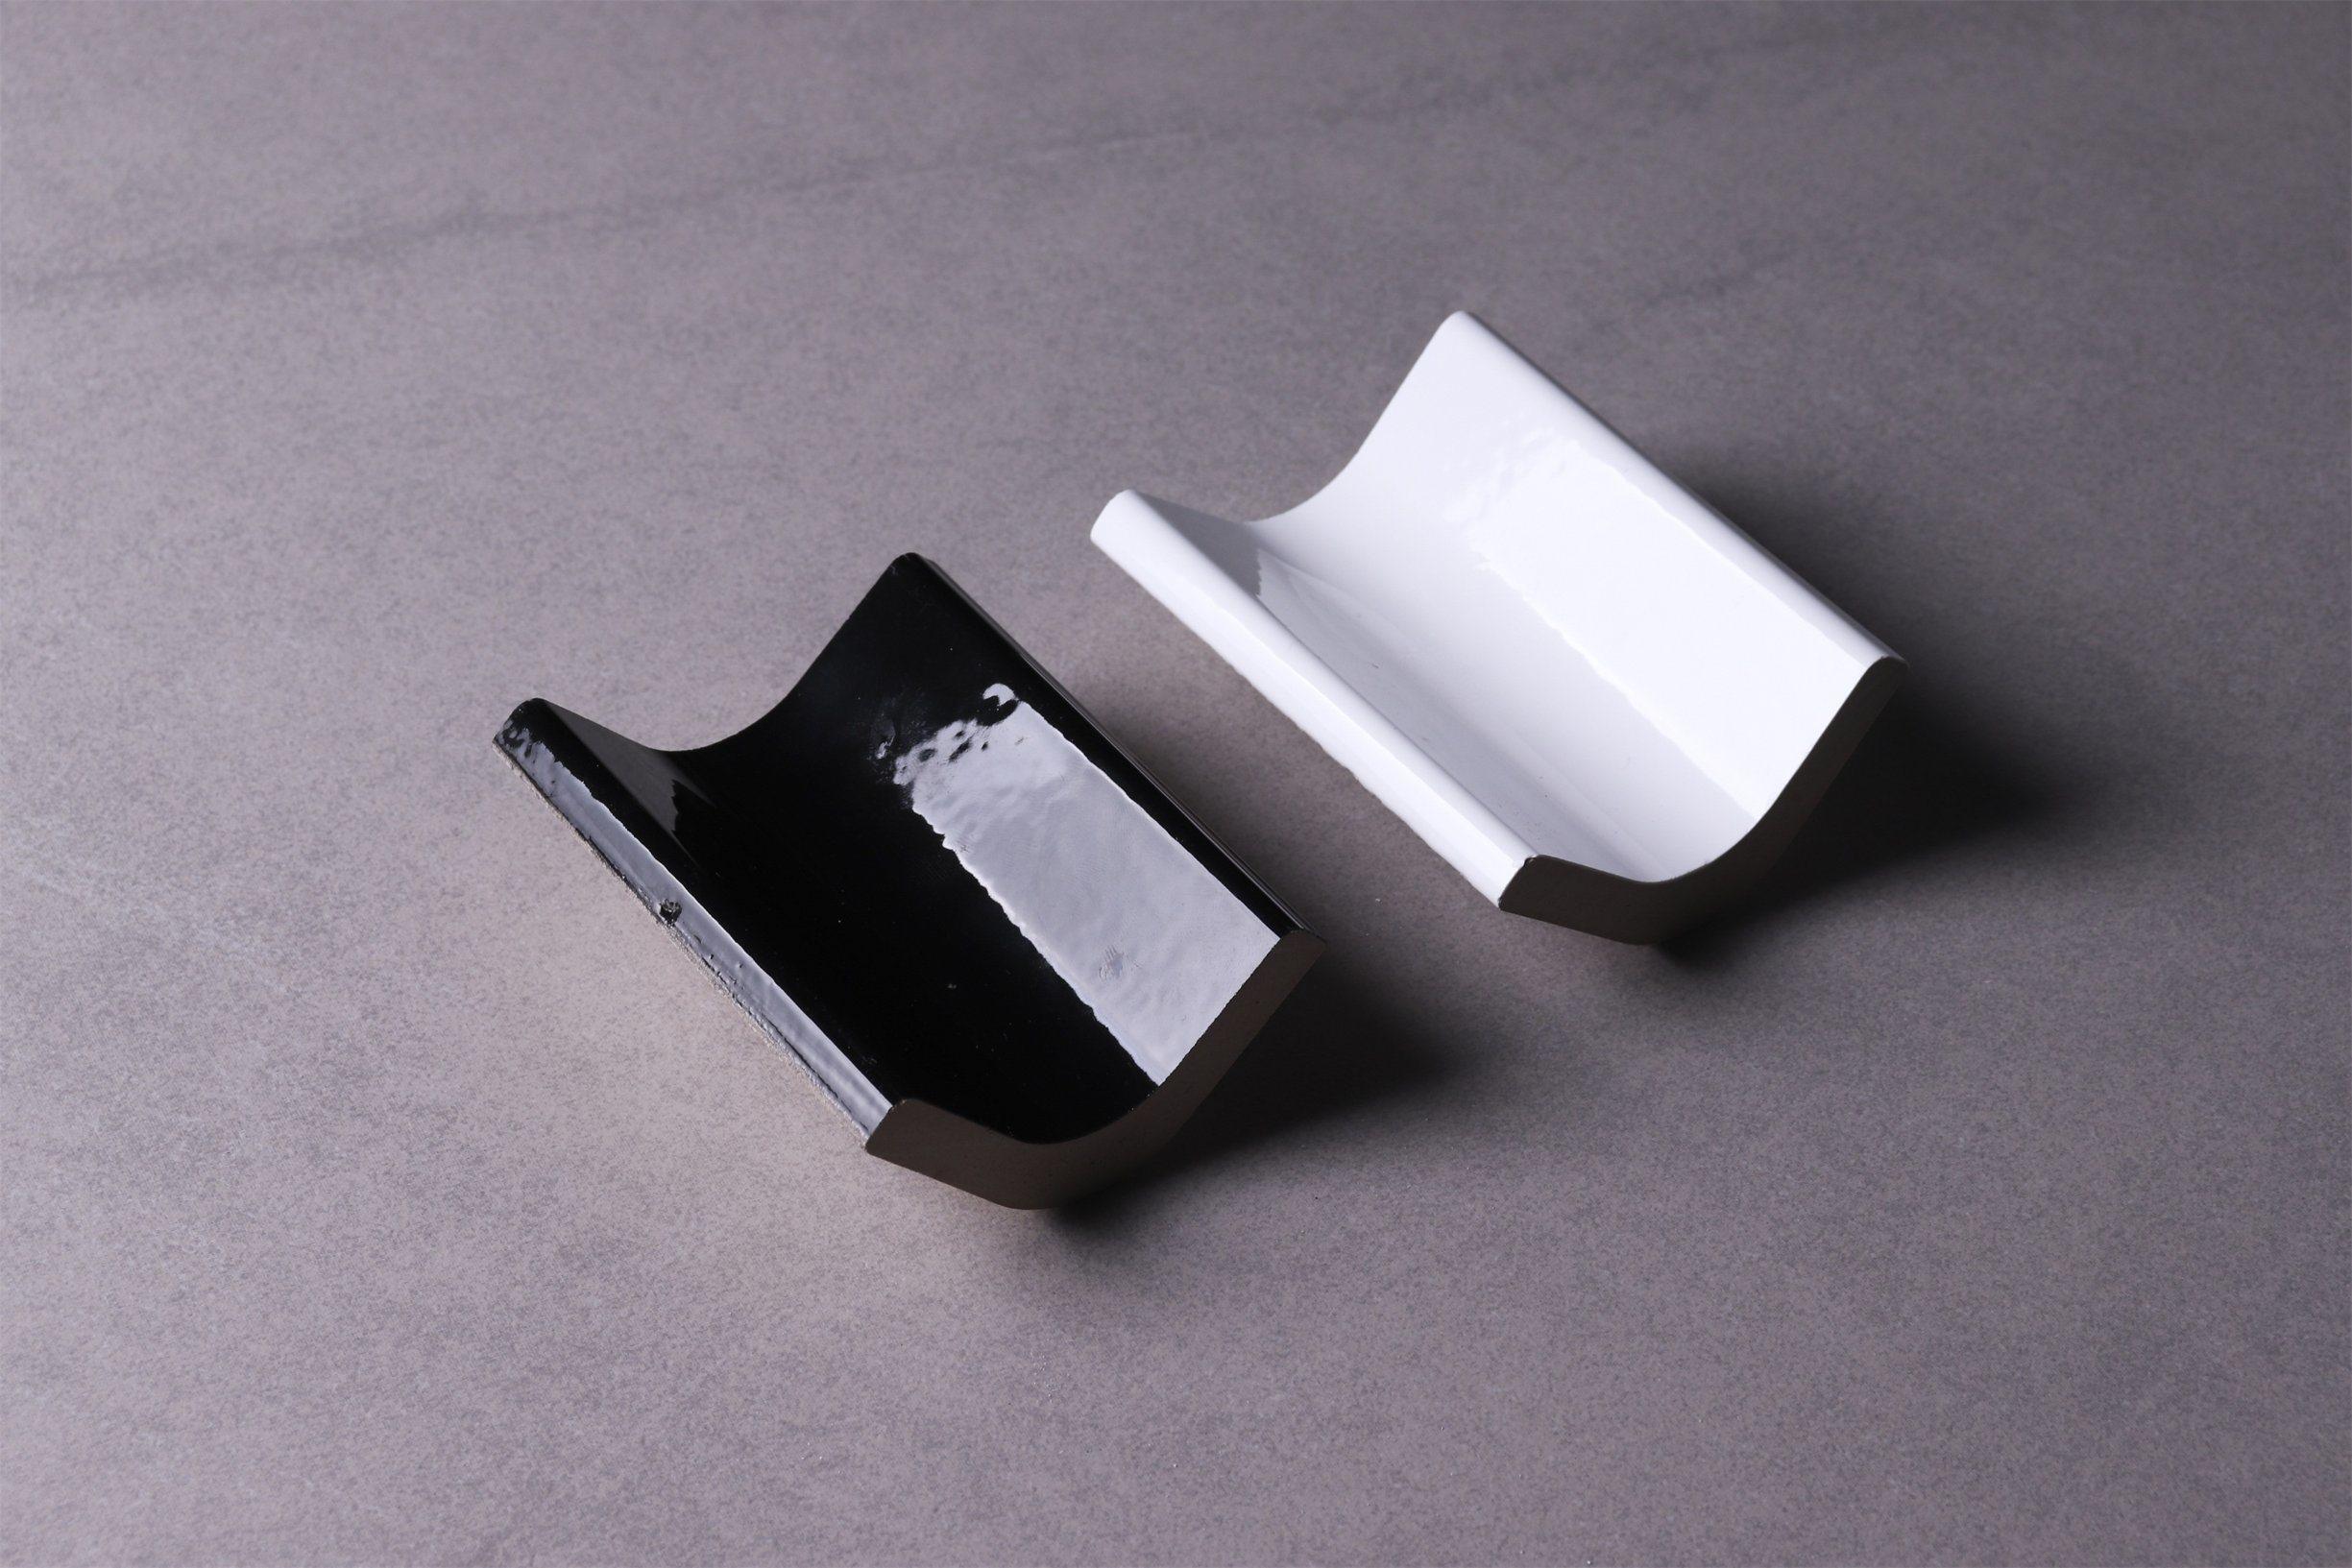 hot item jla black ceramic tile cove base inside corner tile strip trim boeder tiles brick tile accessories